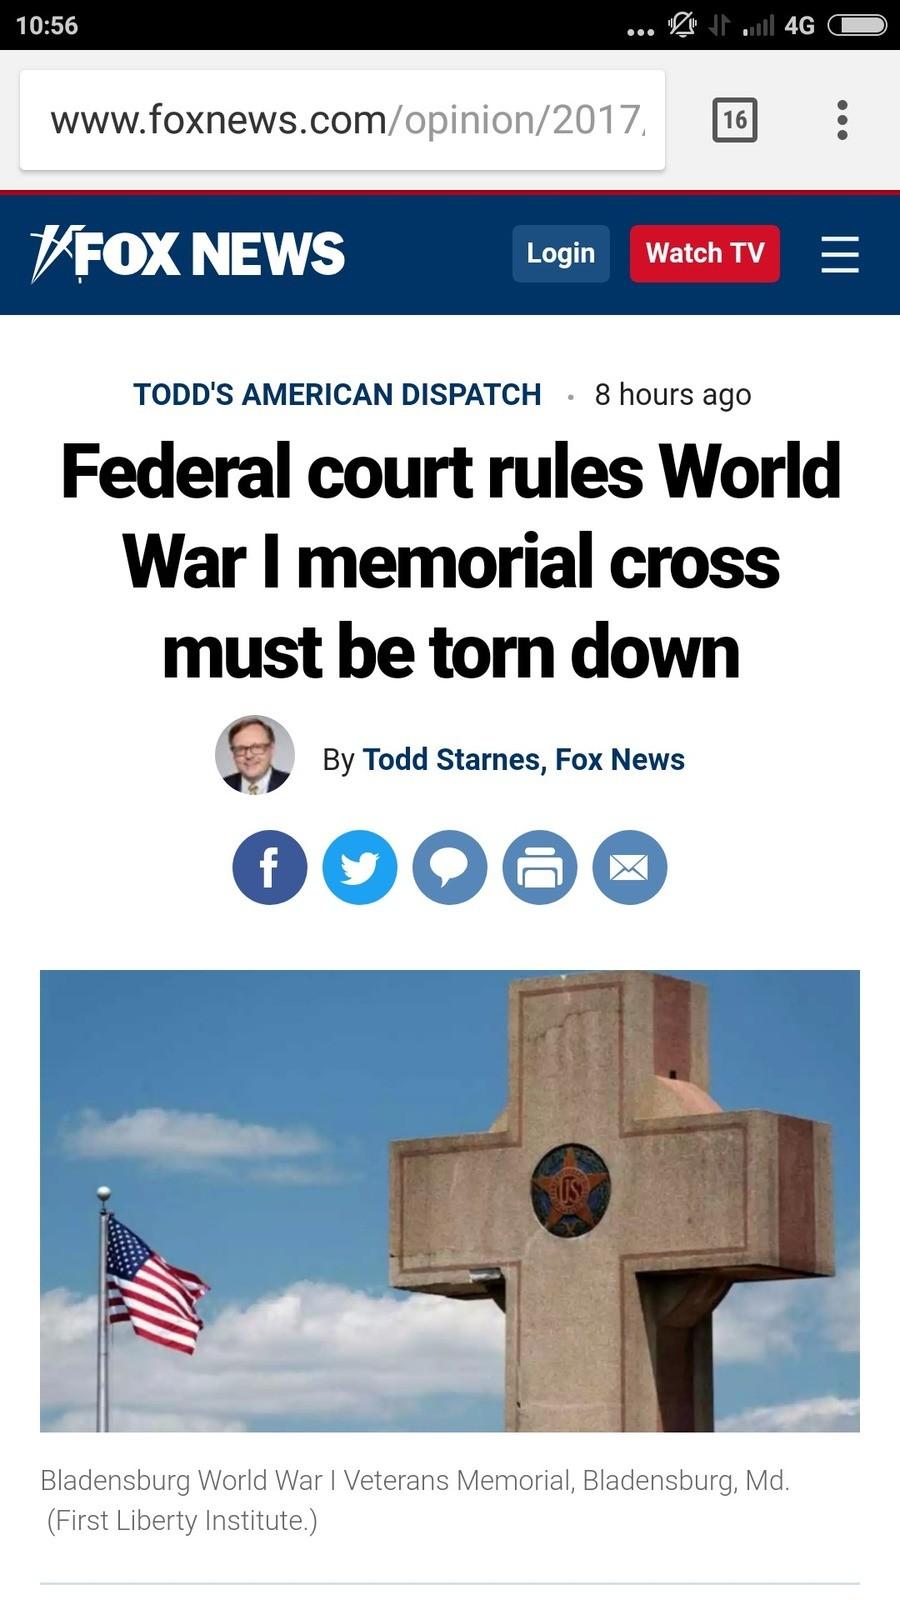 Federal court rules World War I memorial cross must be torn down. www.foxnews.com/opinion/2017/10/18/federal-court-rules-world-war-memorial-cross-must-be-torn-d WW1 memorial Statue tear down lawsuit Atheism world war usa